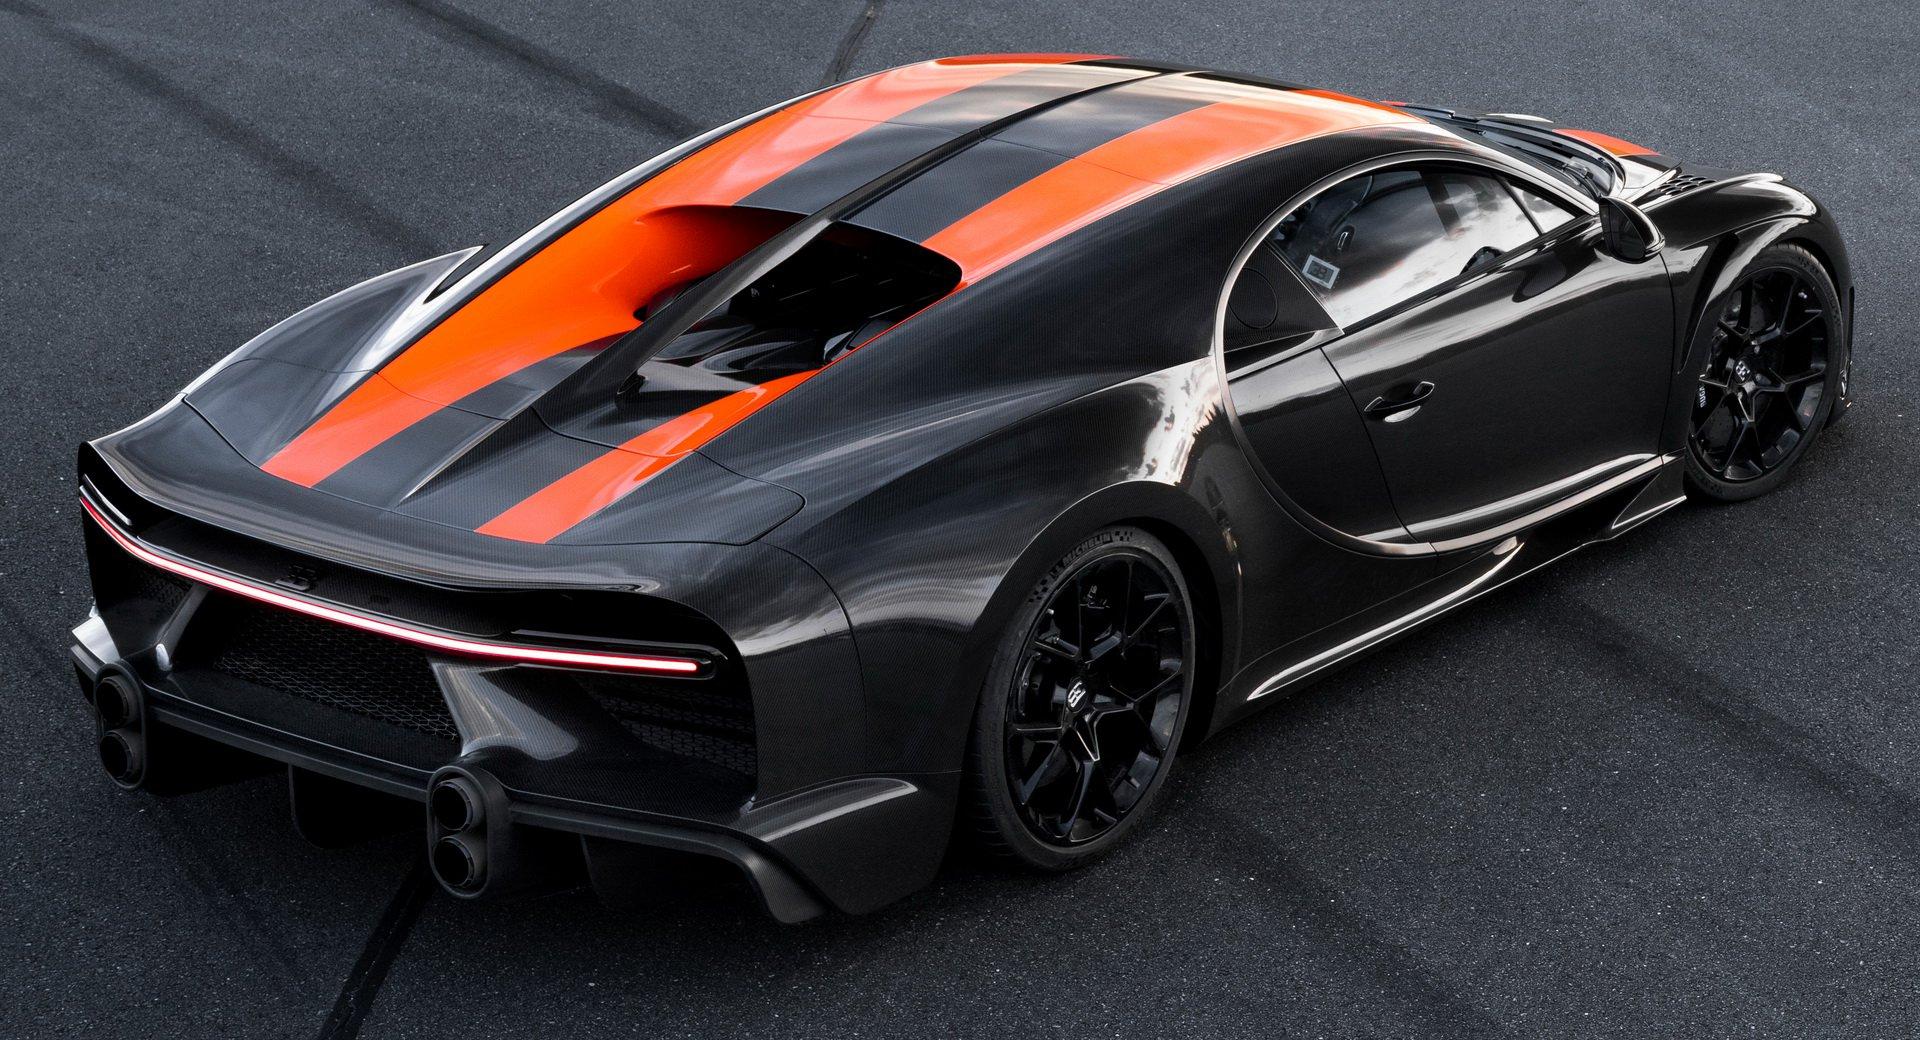 bugatti-chiron-topspeedrun-03.jpg